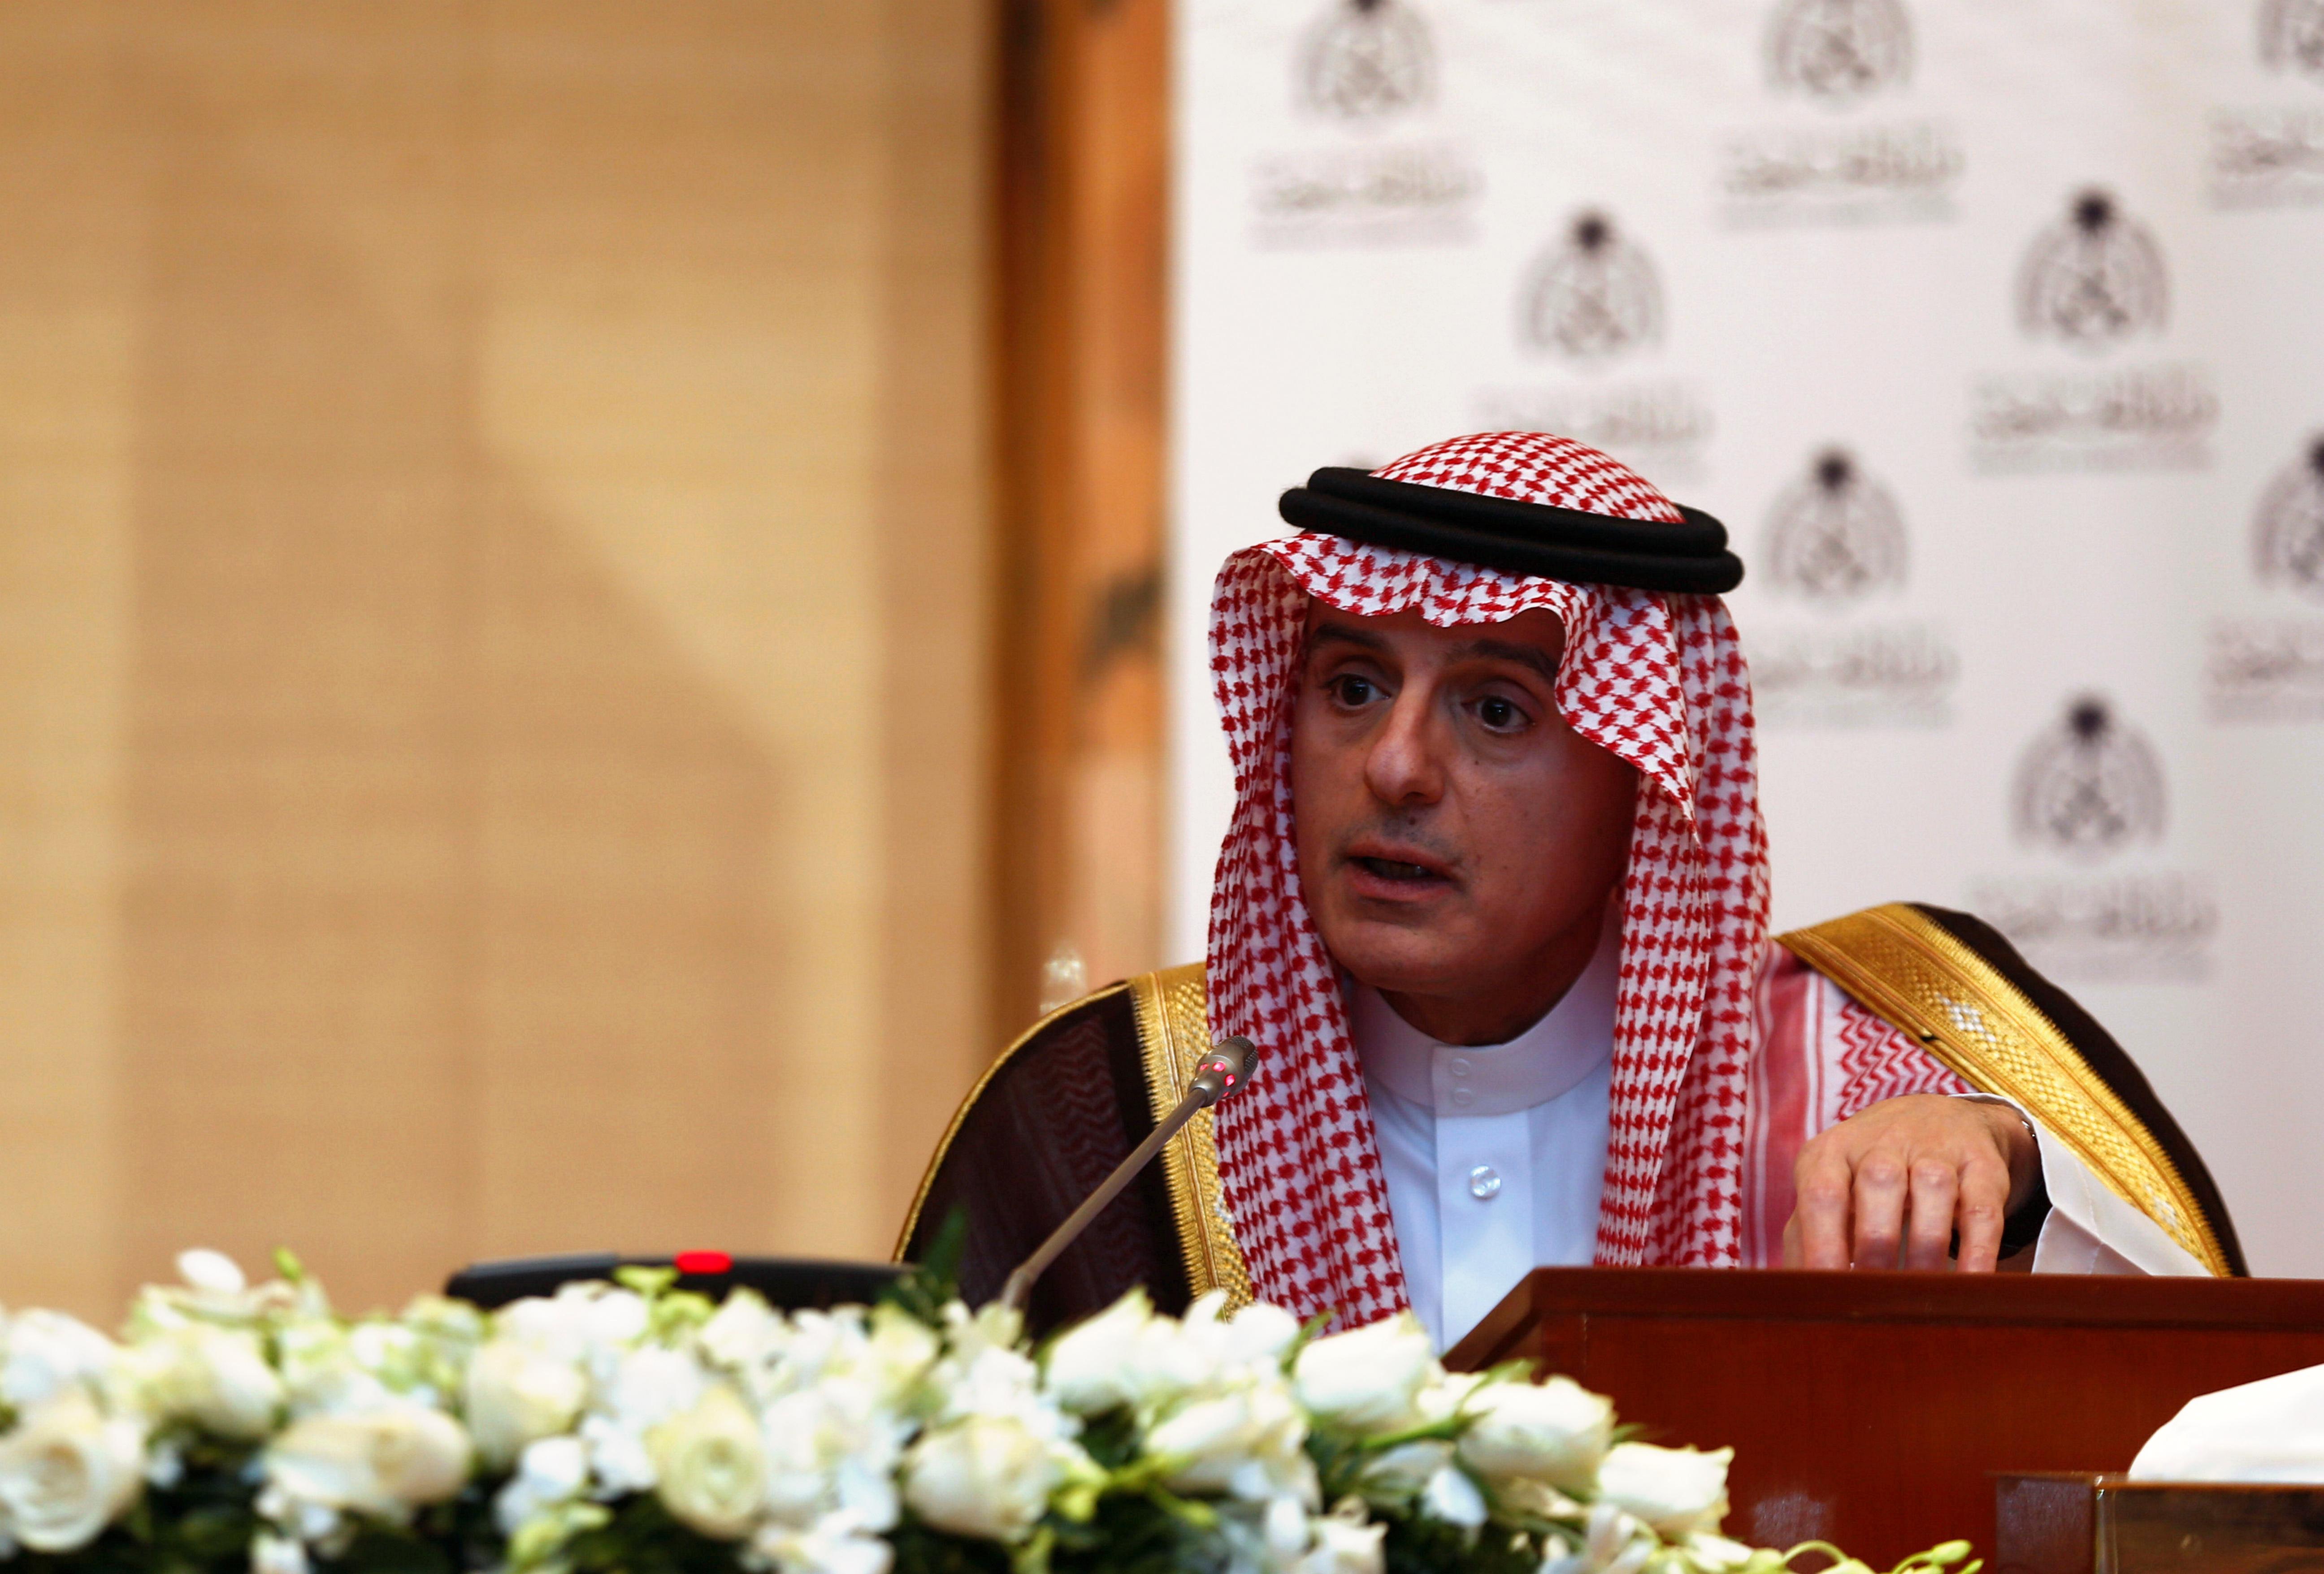 Saudi minister questions neutrality of U.N. report on Khashoggi